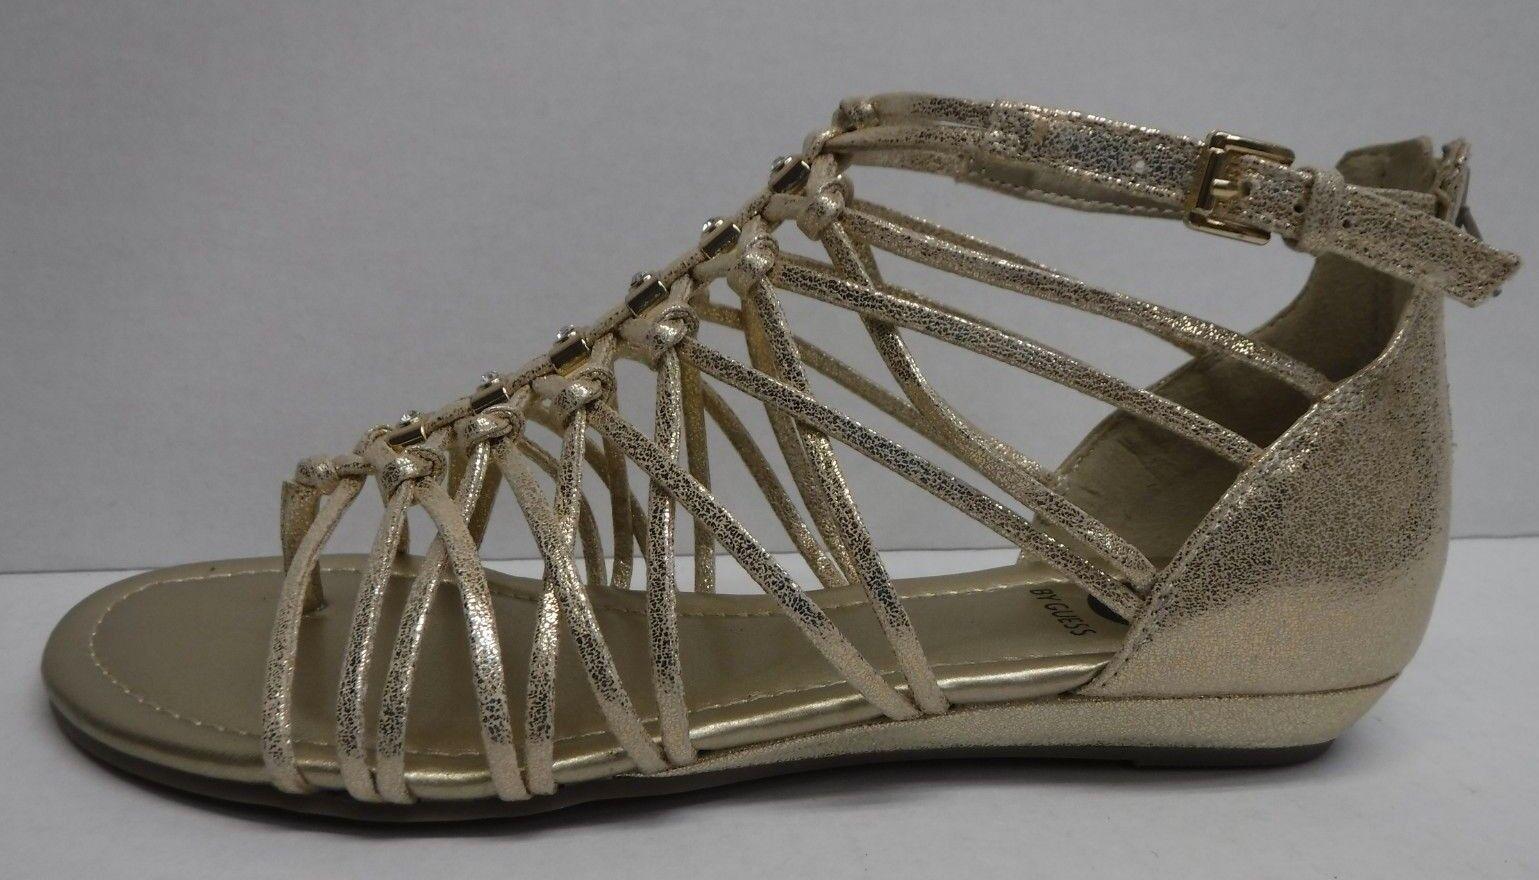 G By Guess Guess Guess Talla 6.5 Nuevos Mujer Zapatos Sandalias De oro  Tienda 2018